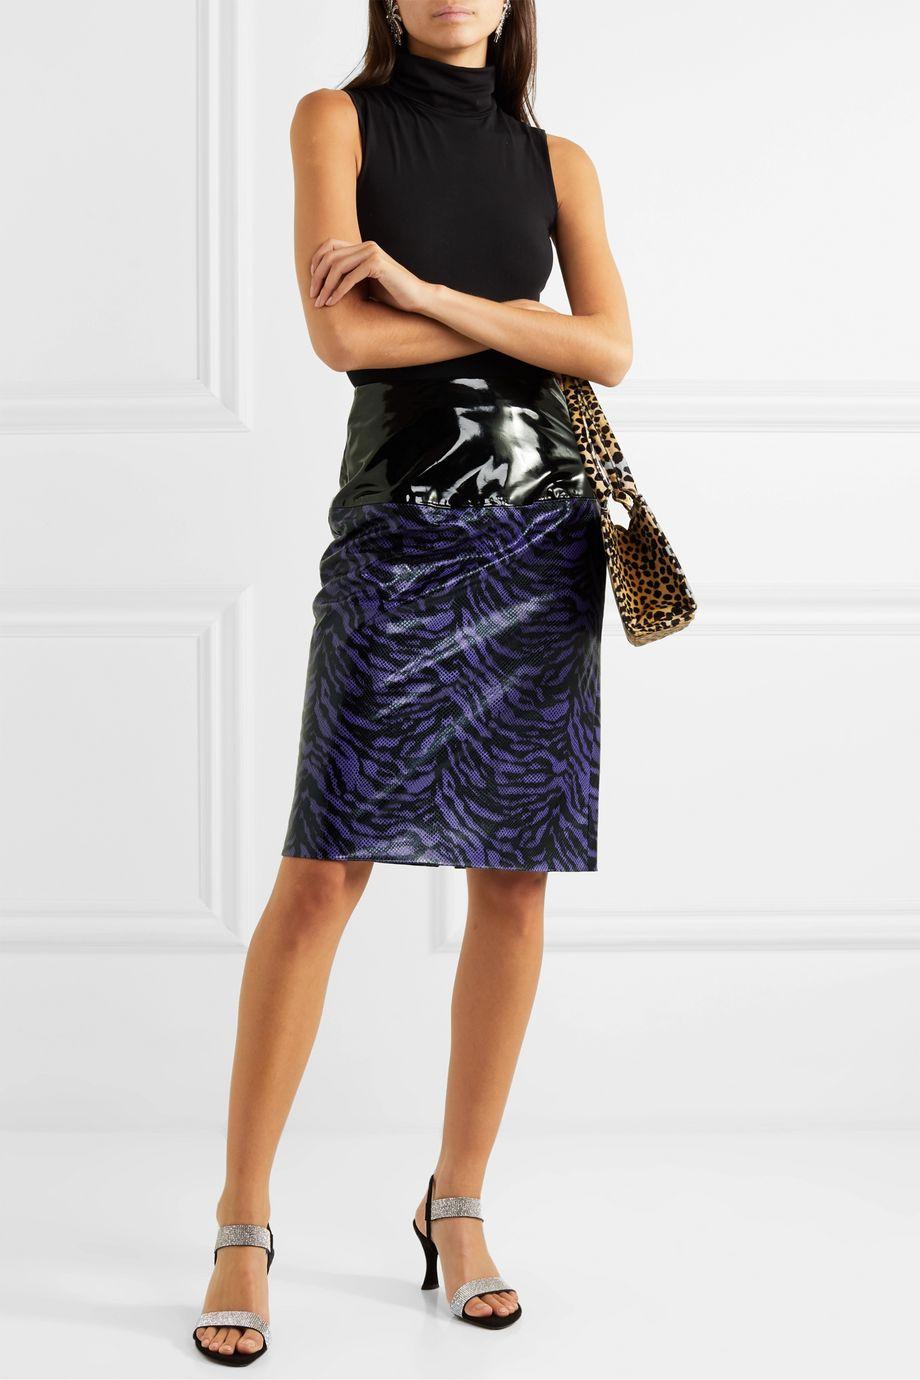 Stand Studio + Pernille Teisbaek Marlee zebra-print faux leather skirt